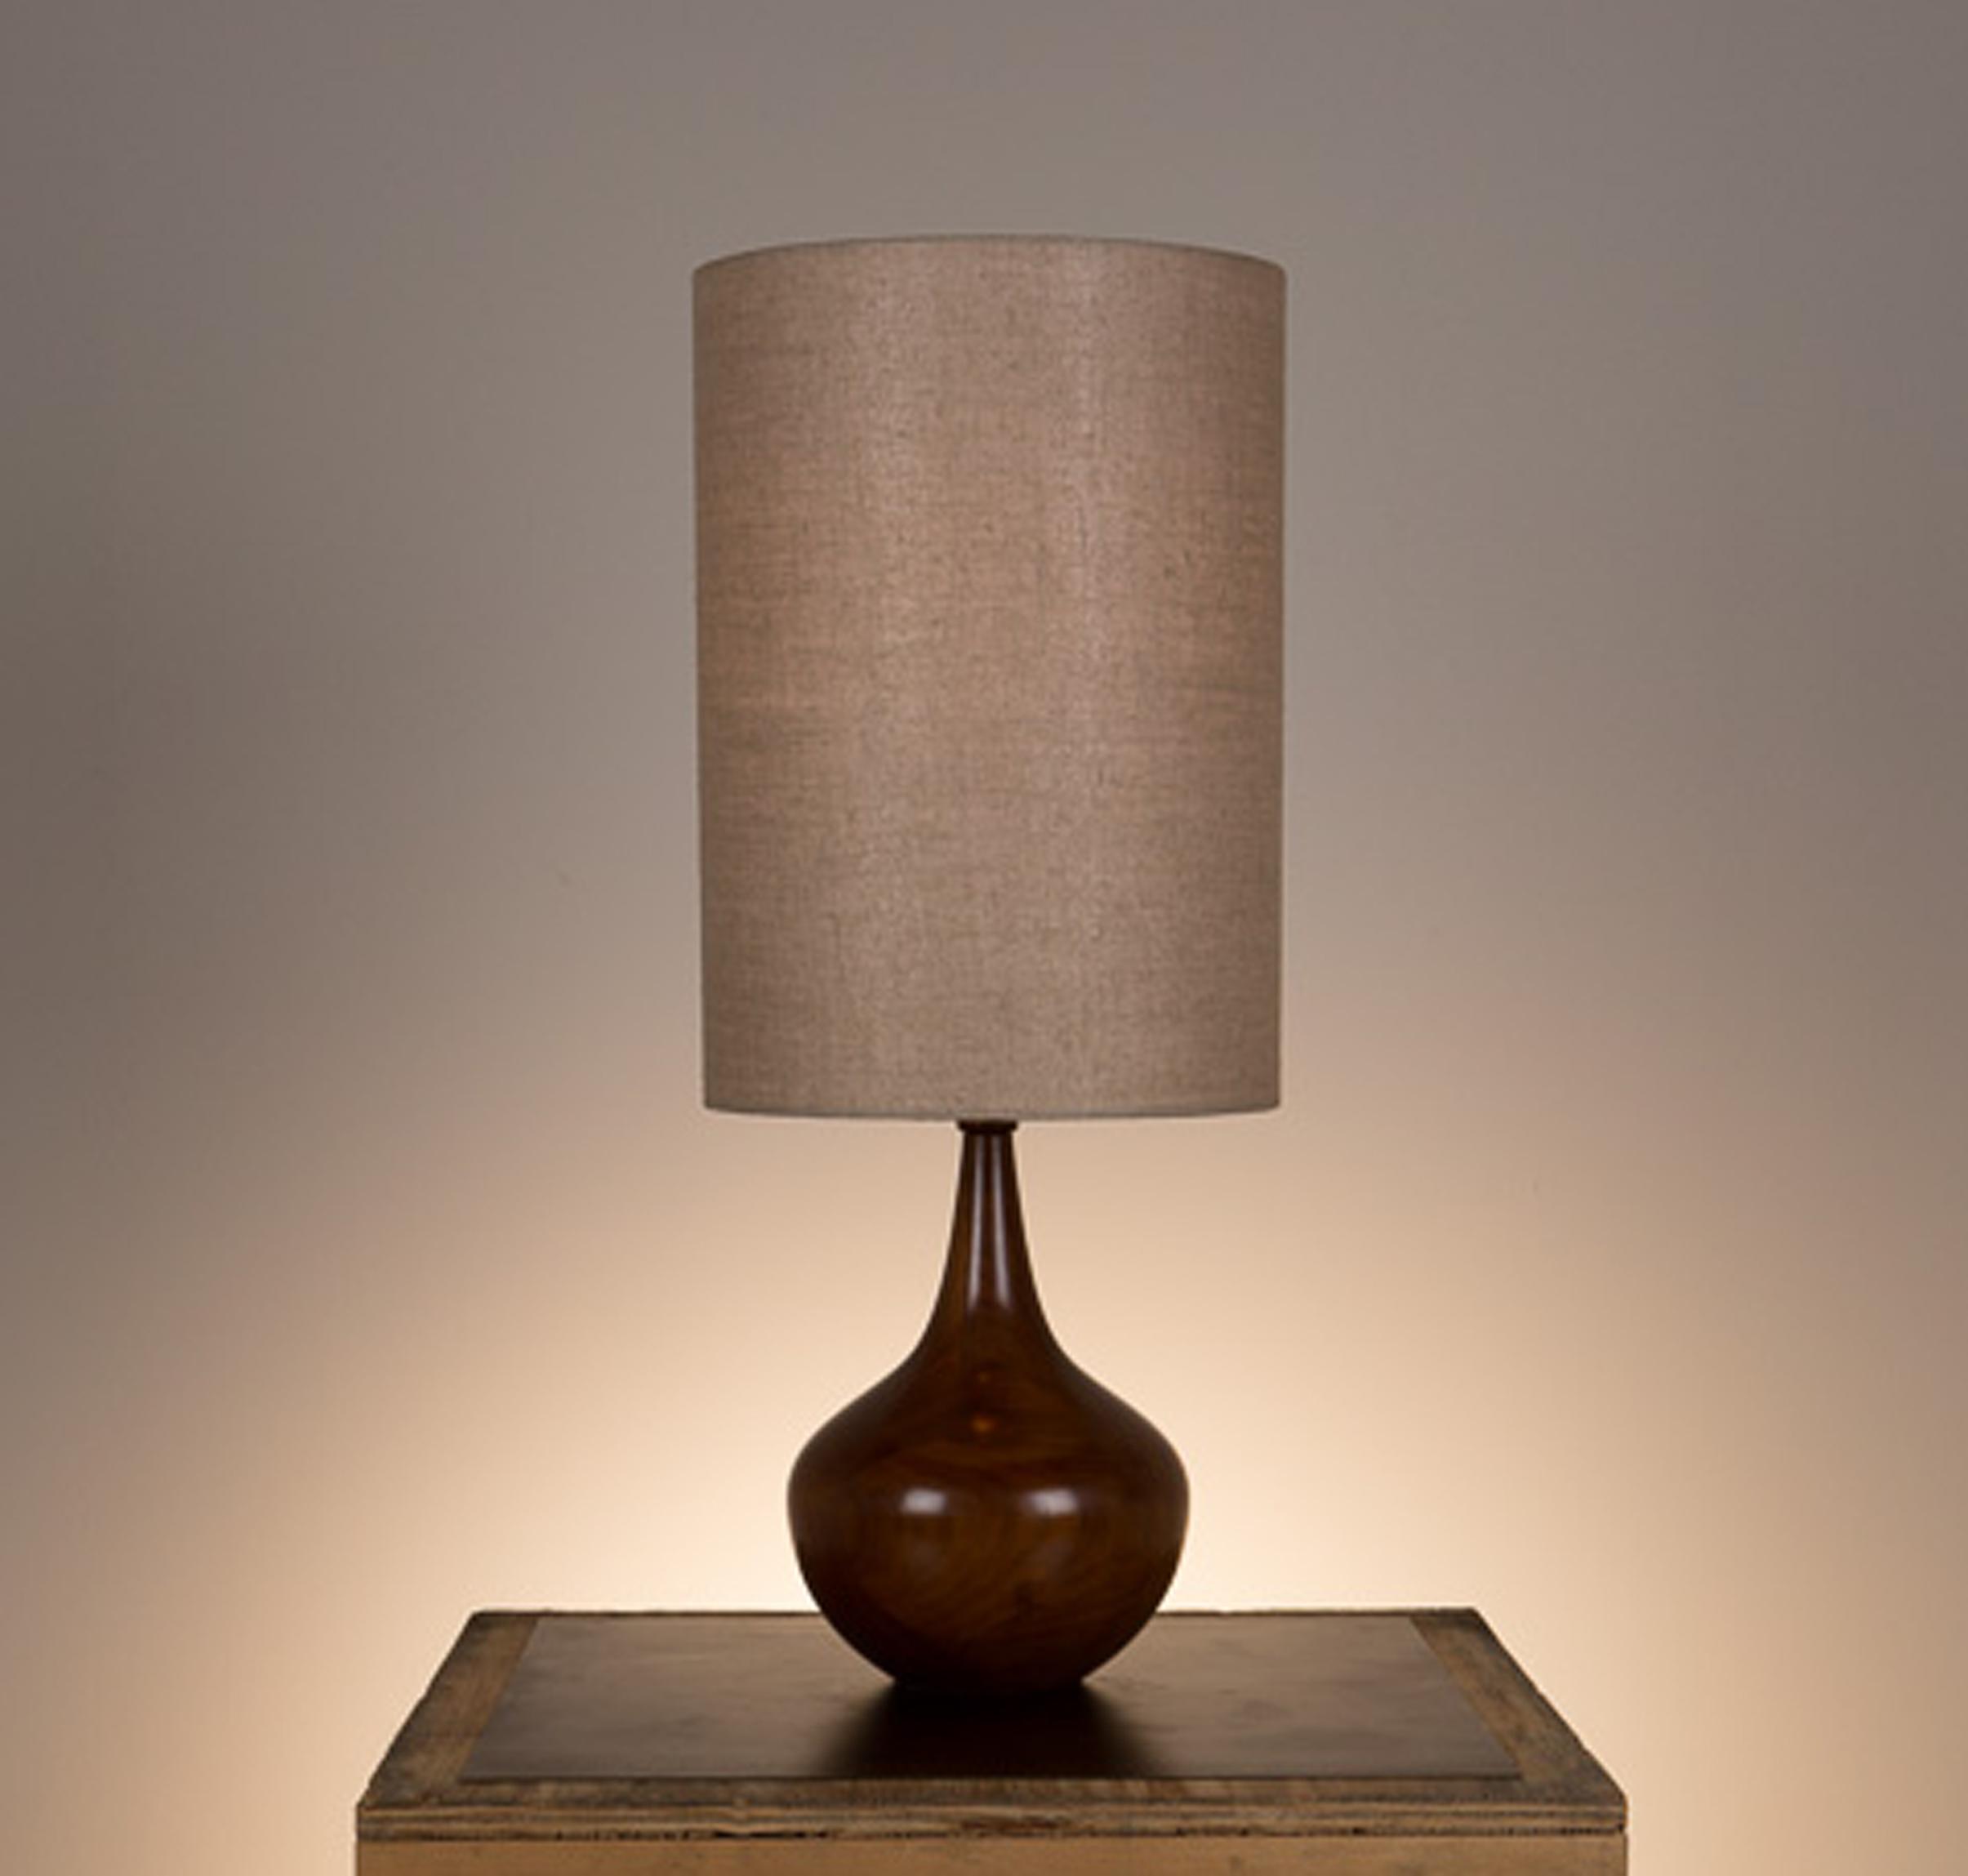 Bradley Table Lamp #2  Walnut in a medium brown finish. Open top lamp shade in 817 beige linen.